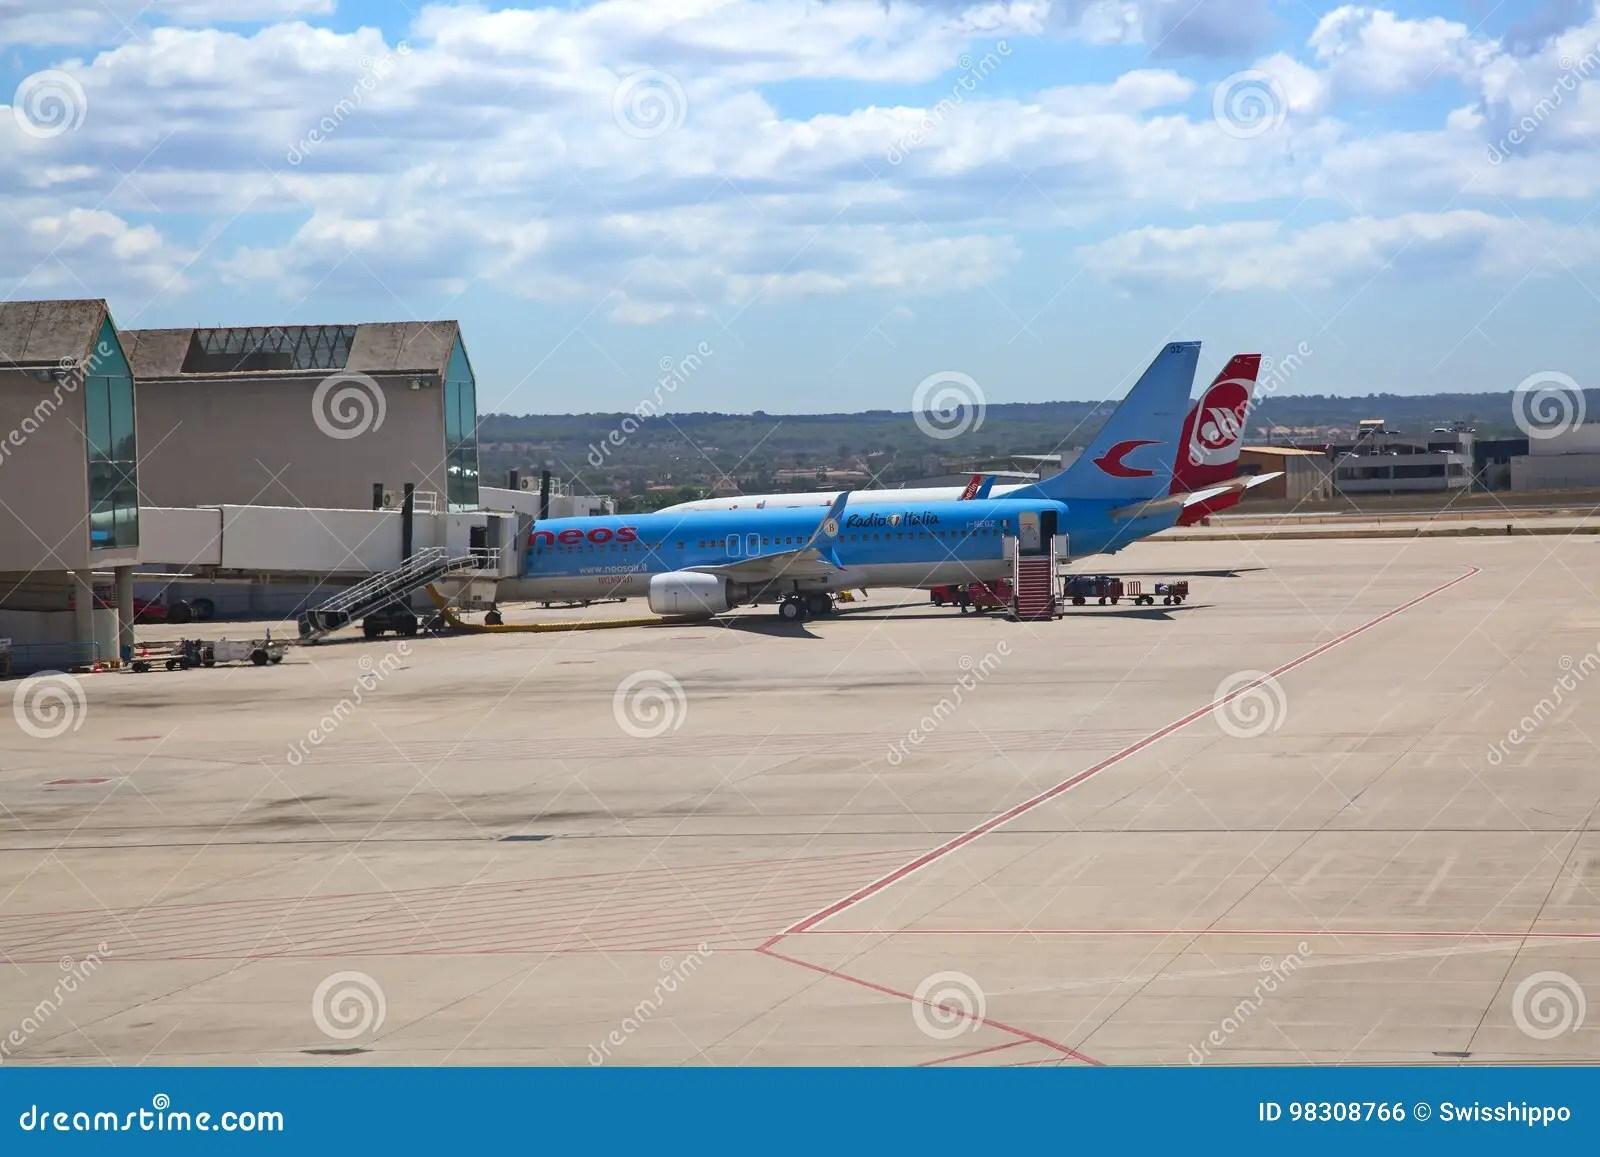 https de dreamstime com redaktionelles foto palma de mallorca airport image98308766